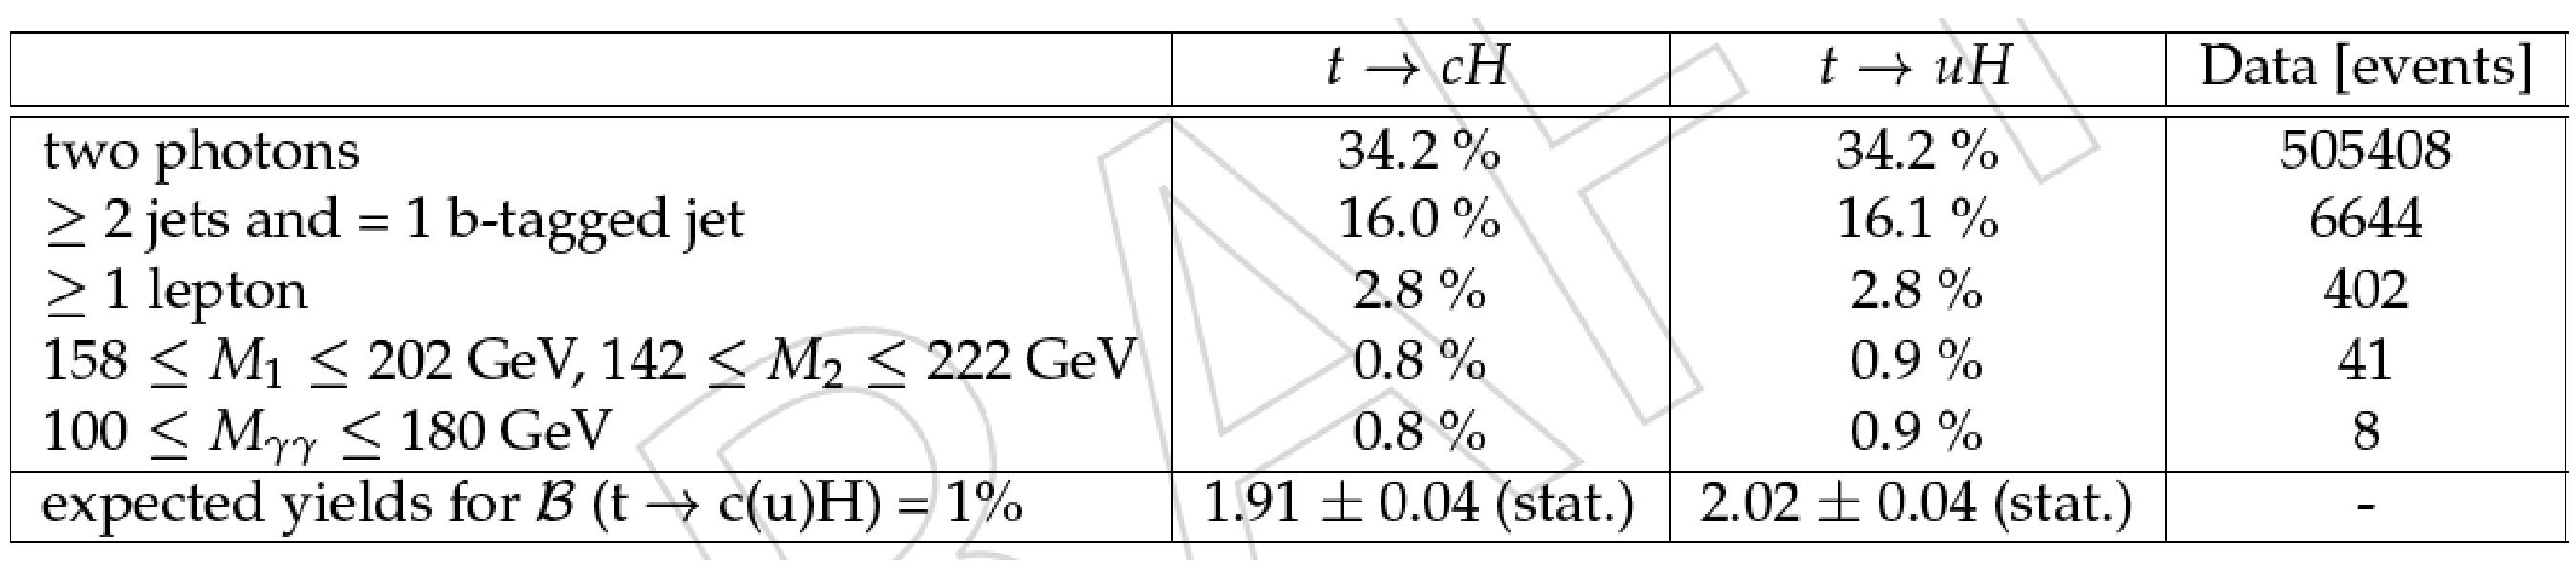 efficiencies_yields_leptonic.png